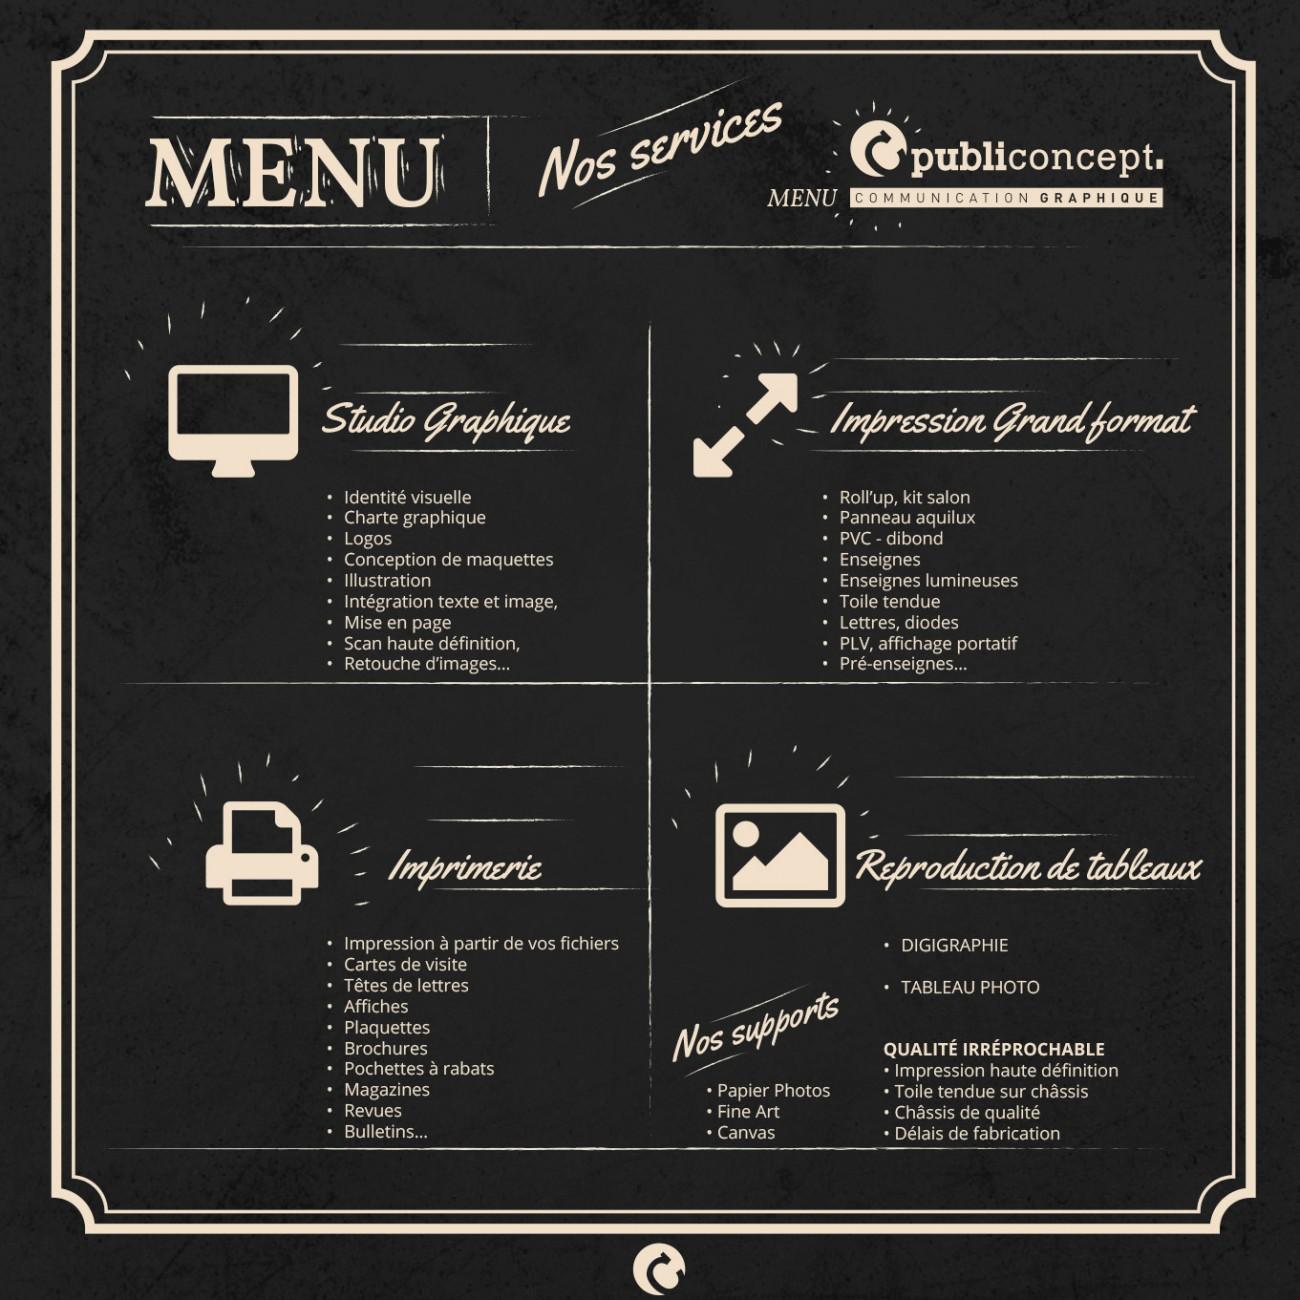 menu_graphique